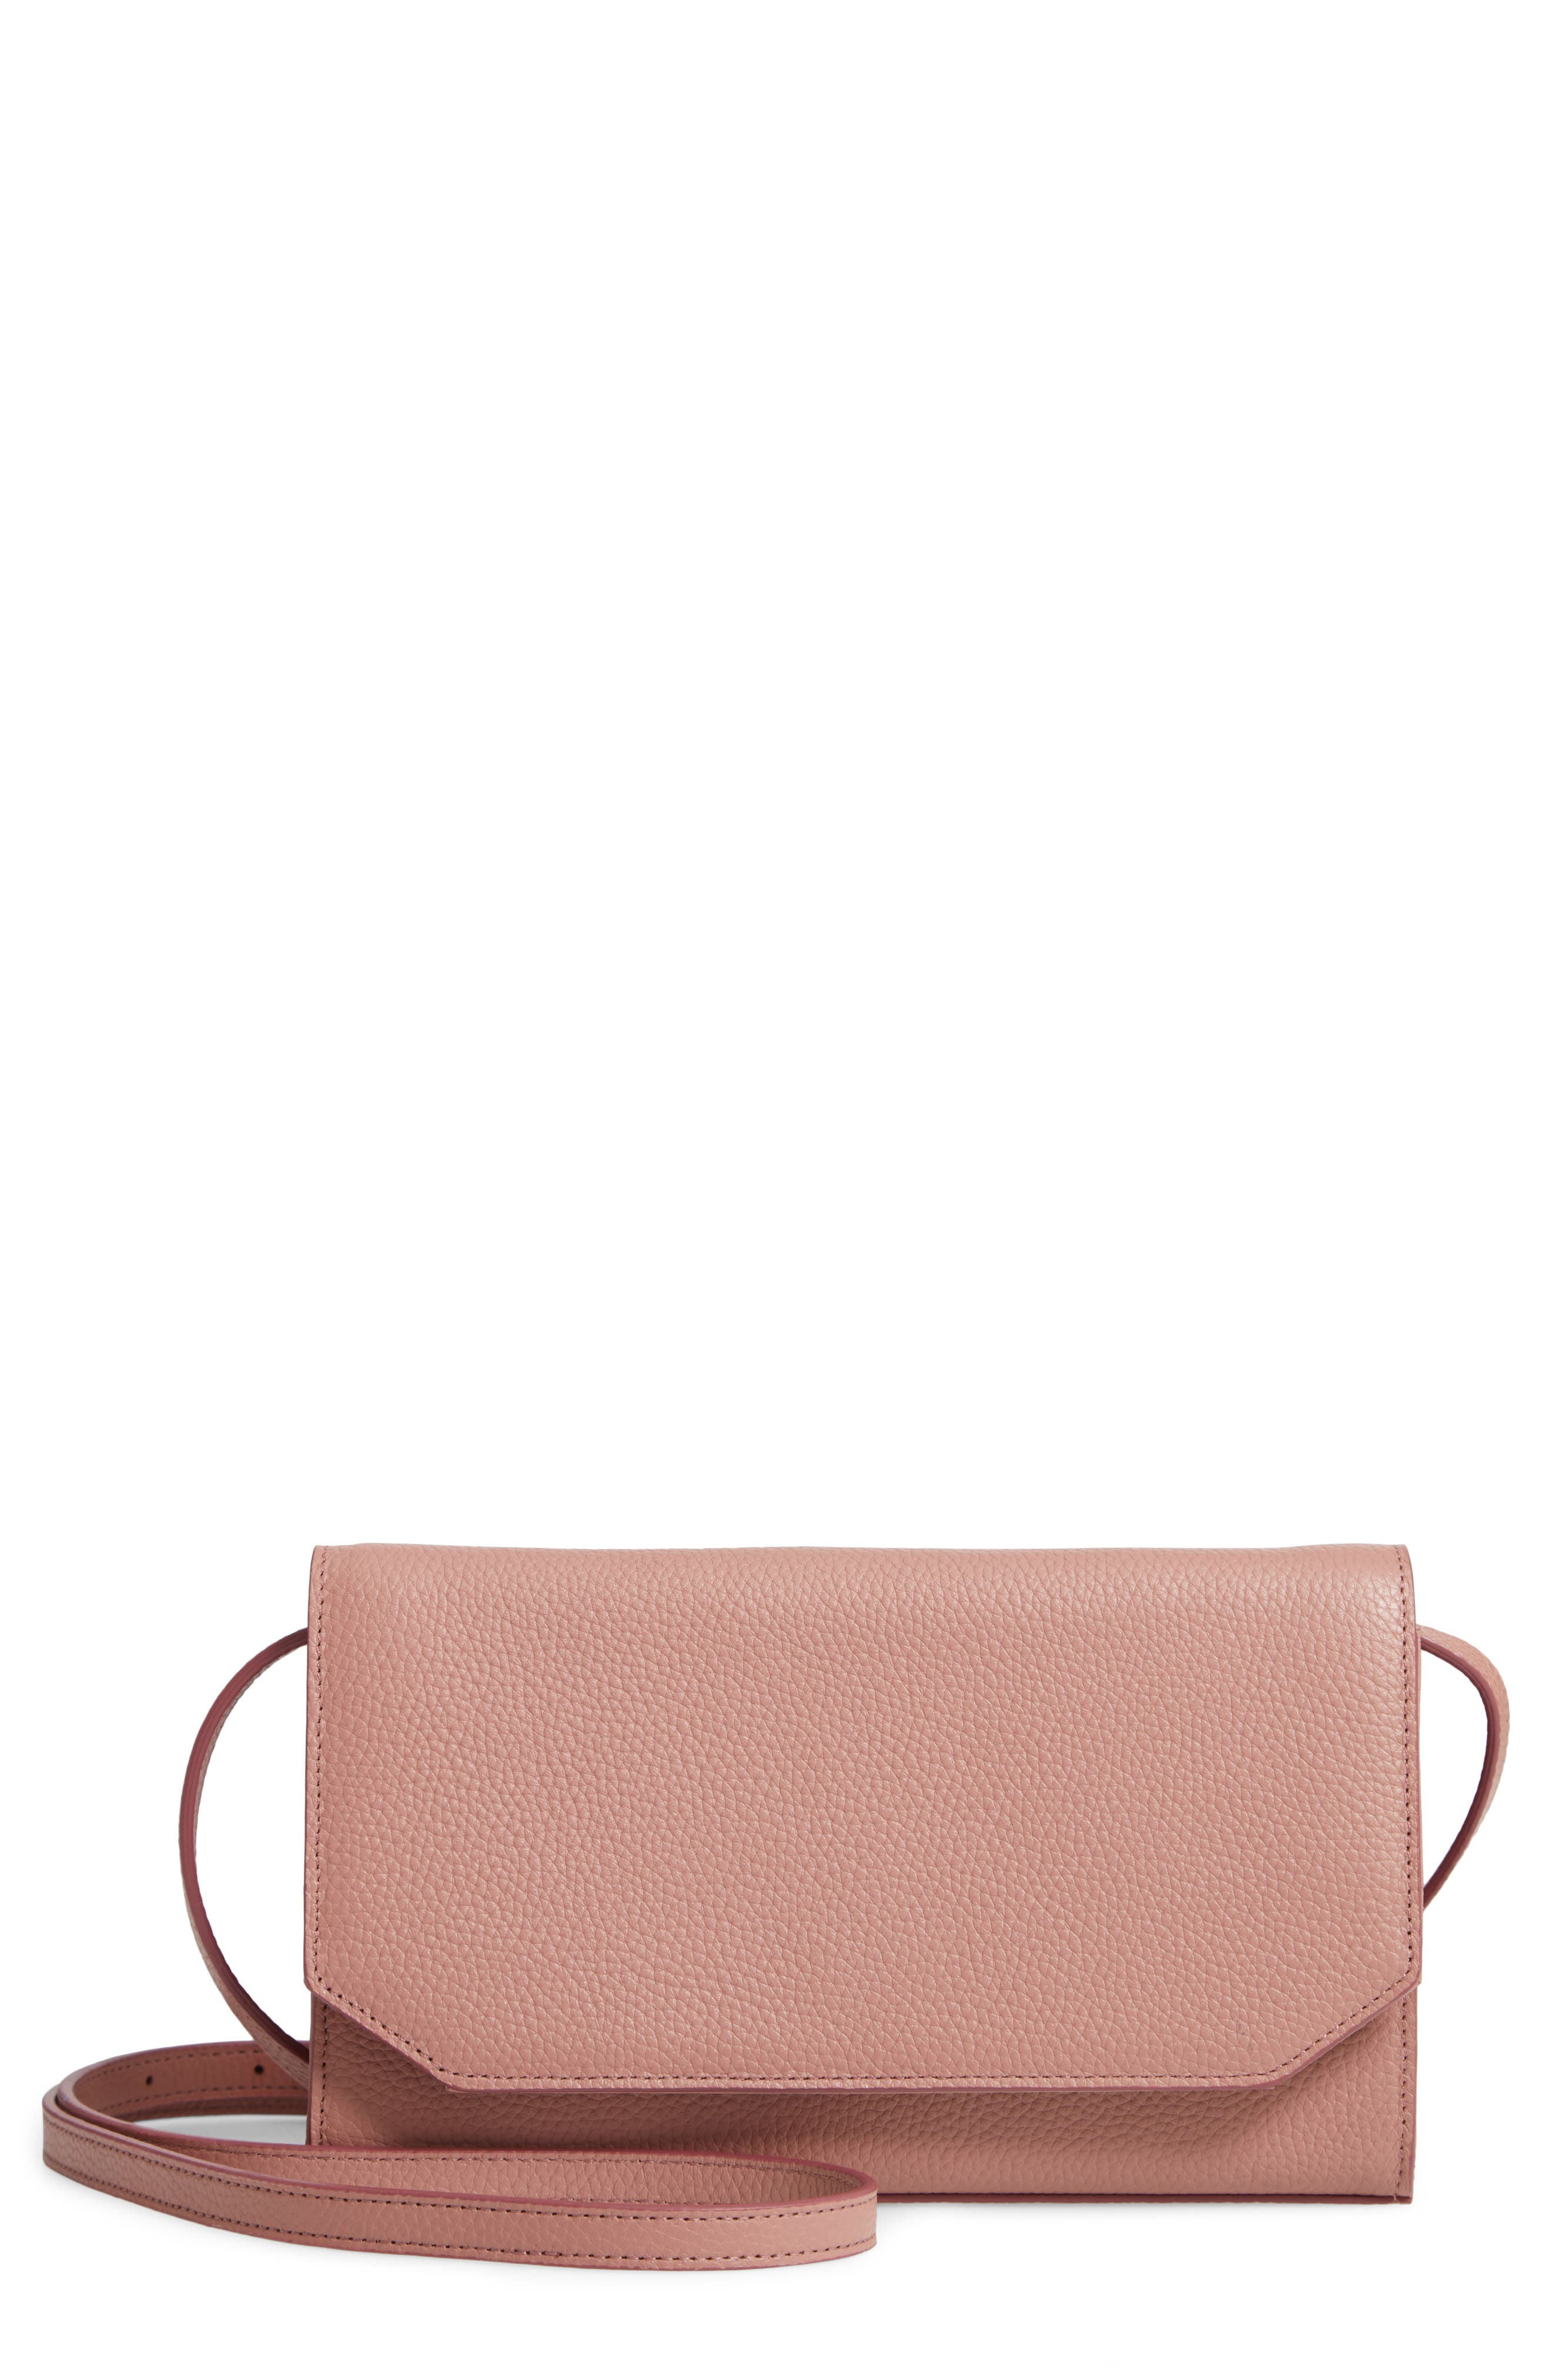 8ef1460205e3 Handbags   Accessories  Sale